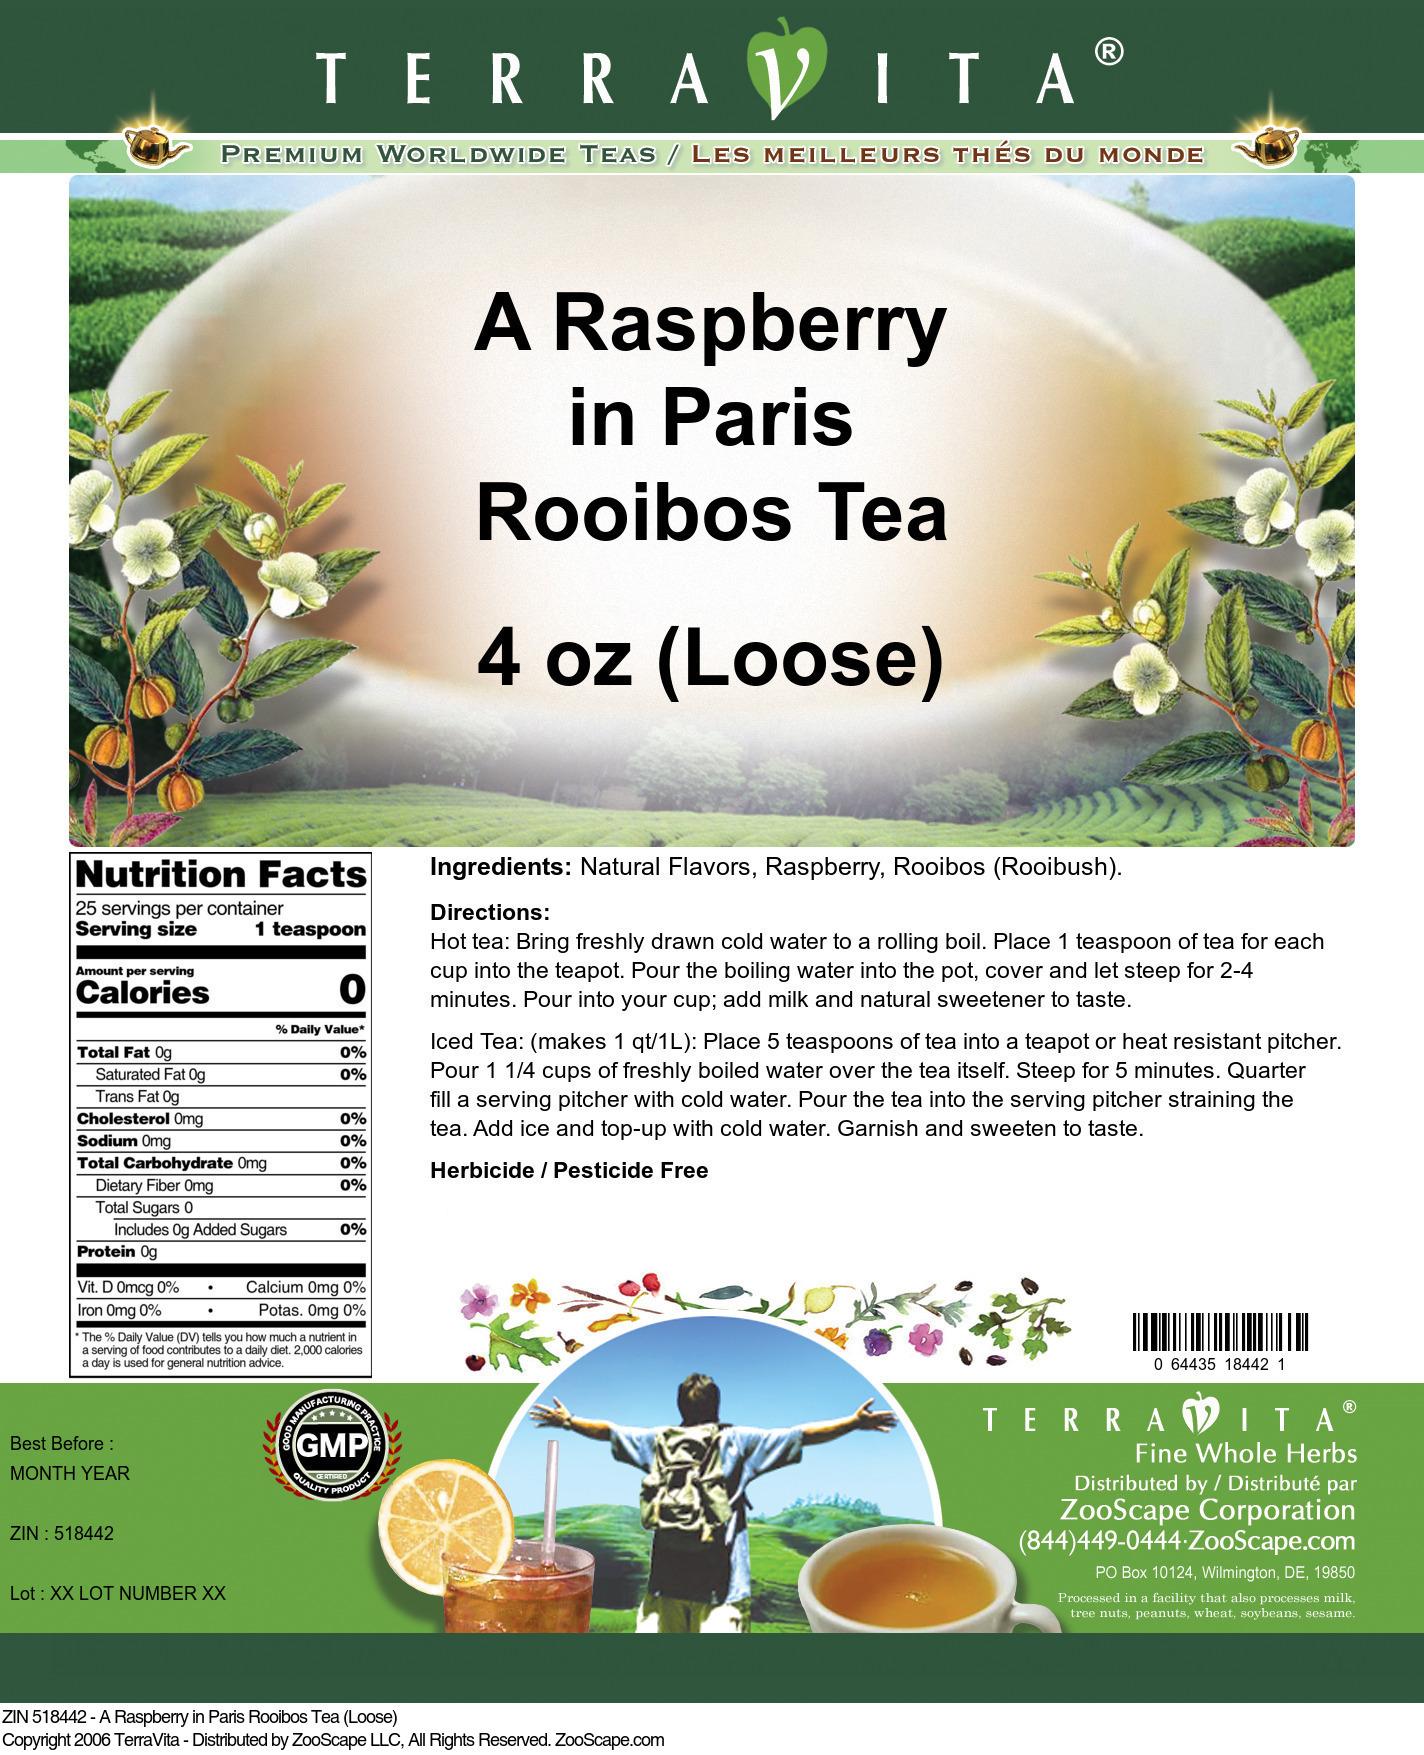 A Raspberry in Paris Rooibos Tea (Loose)